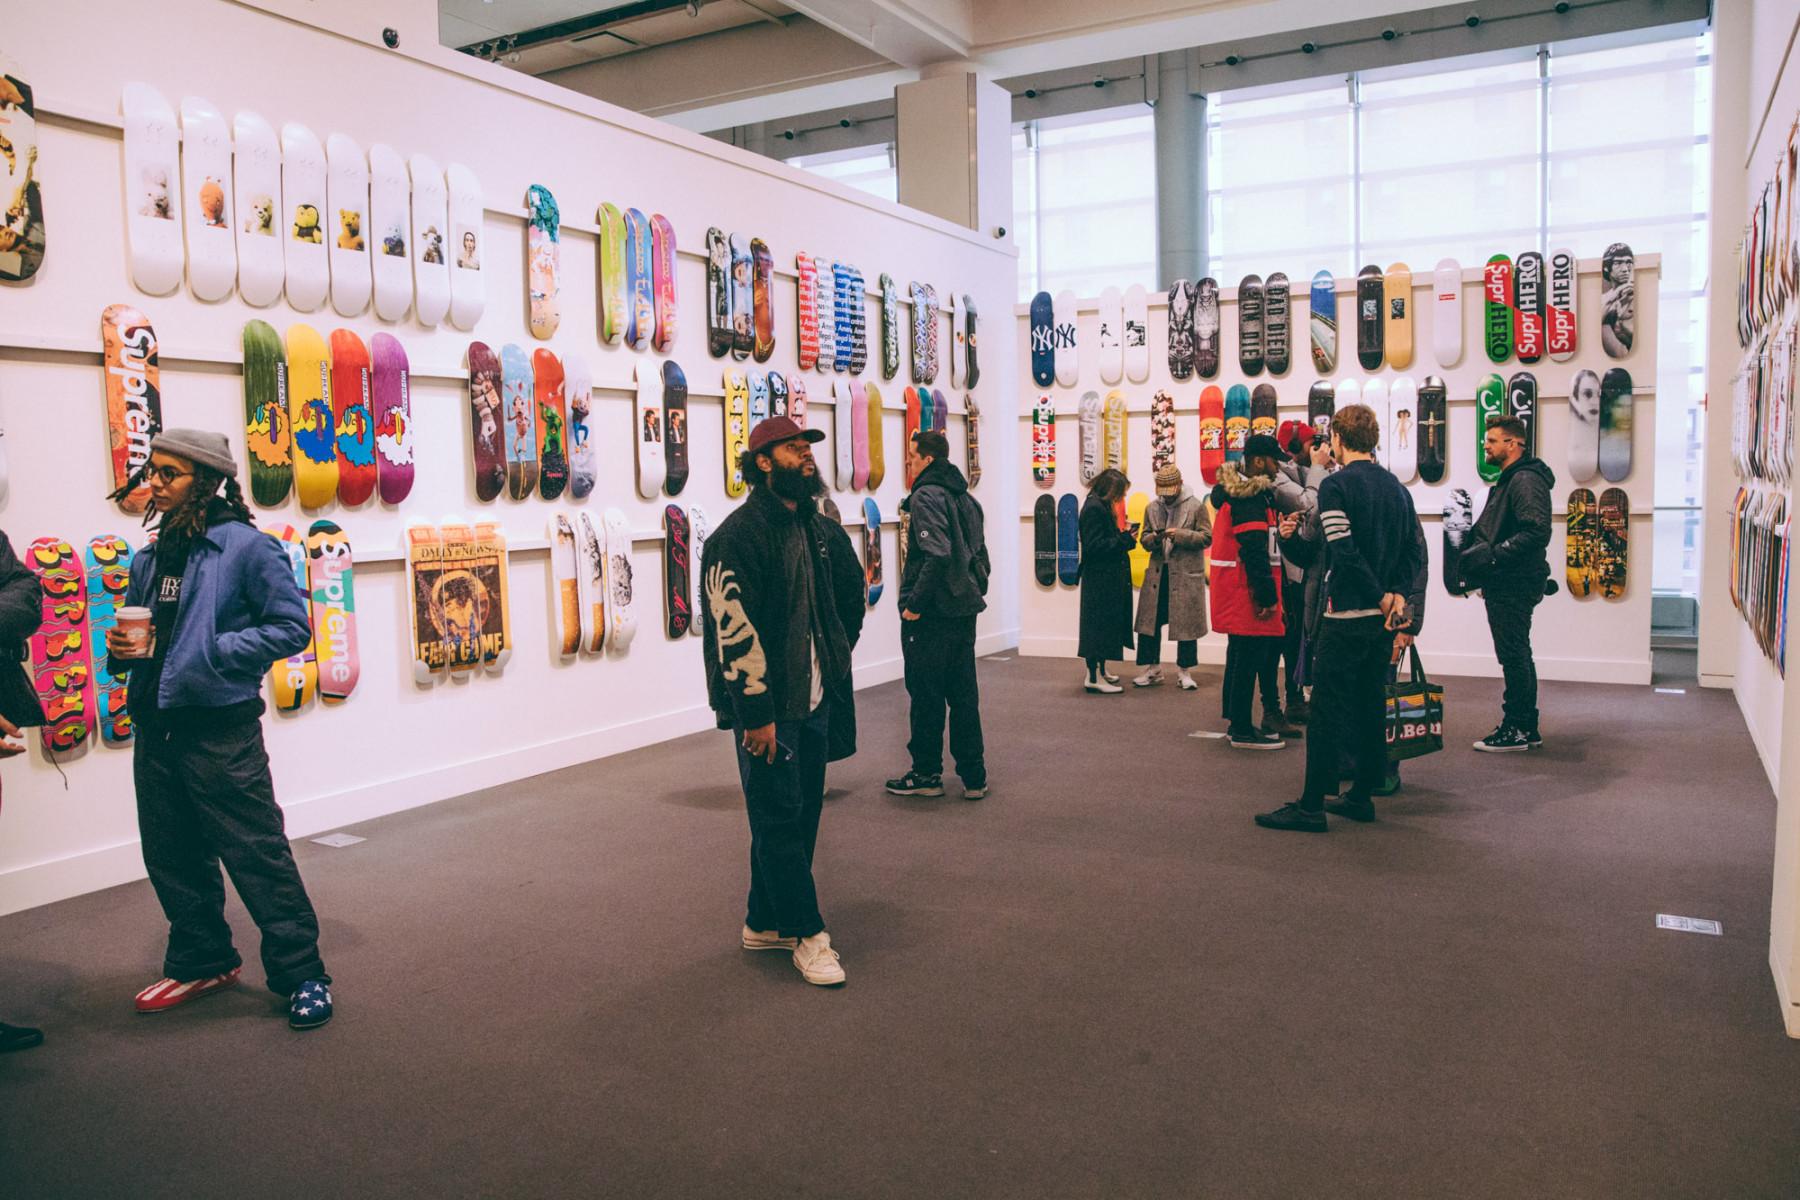 Sothebys-Supreme-Skate-Decks-24-1800x1200